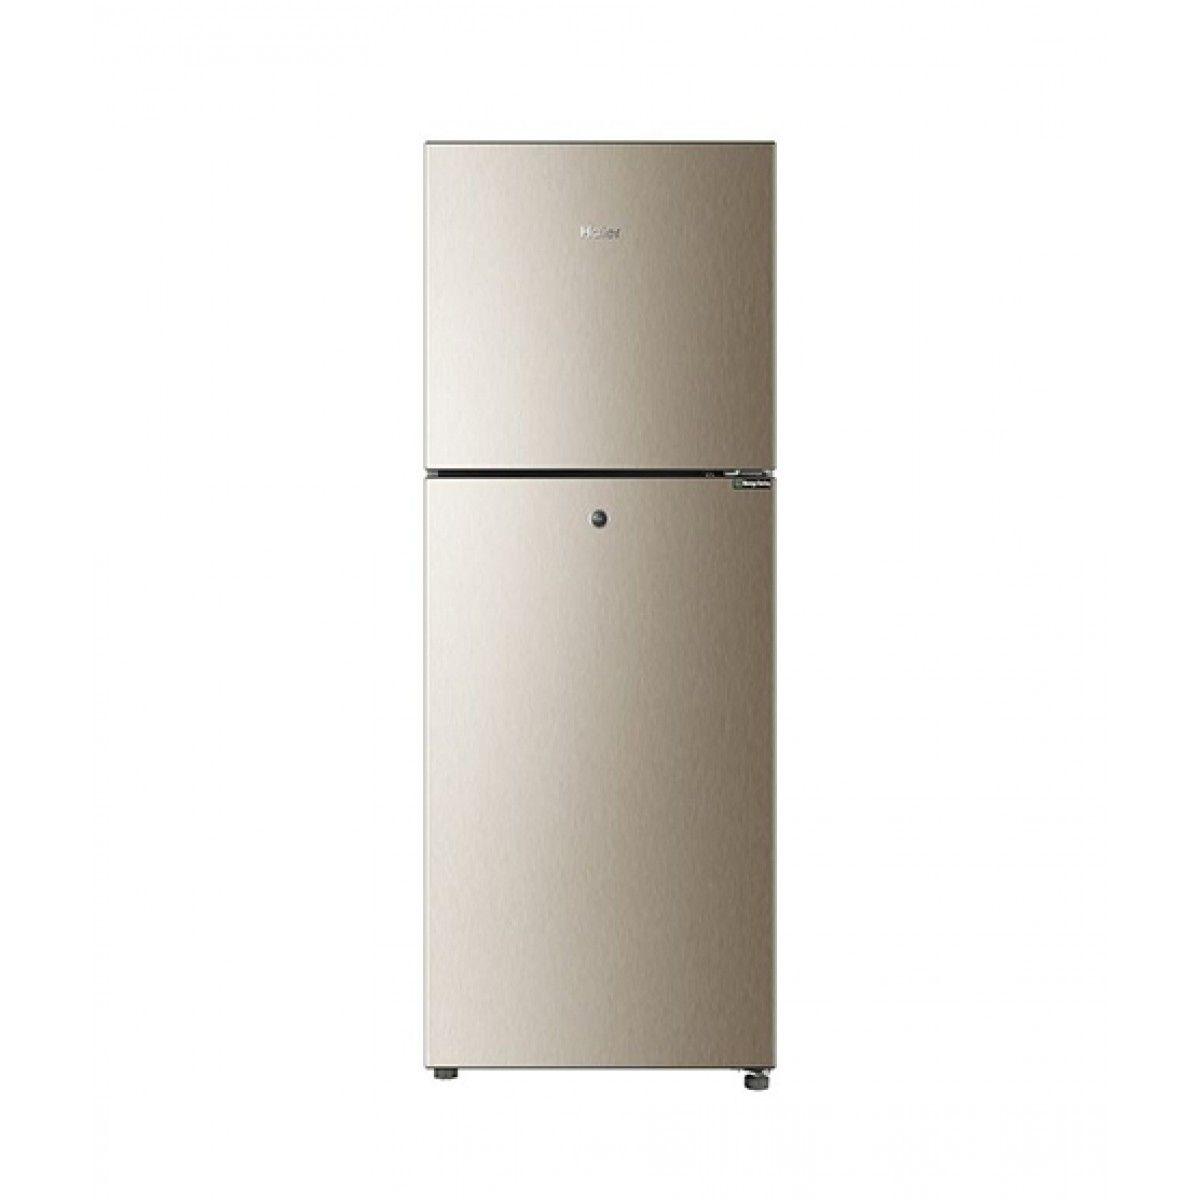 Haier HRF-246EBD 7.5 Cu Ft Refrigerator